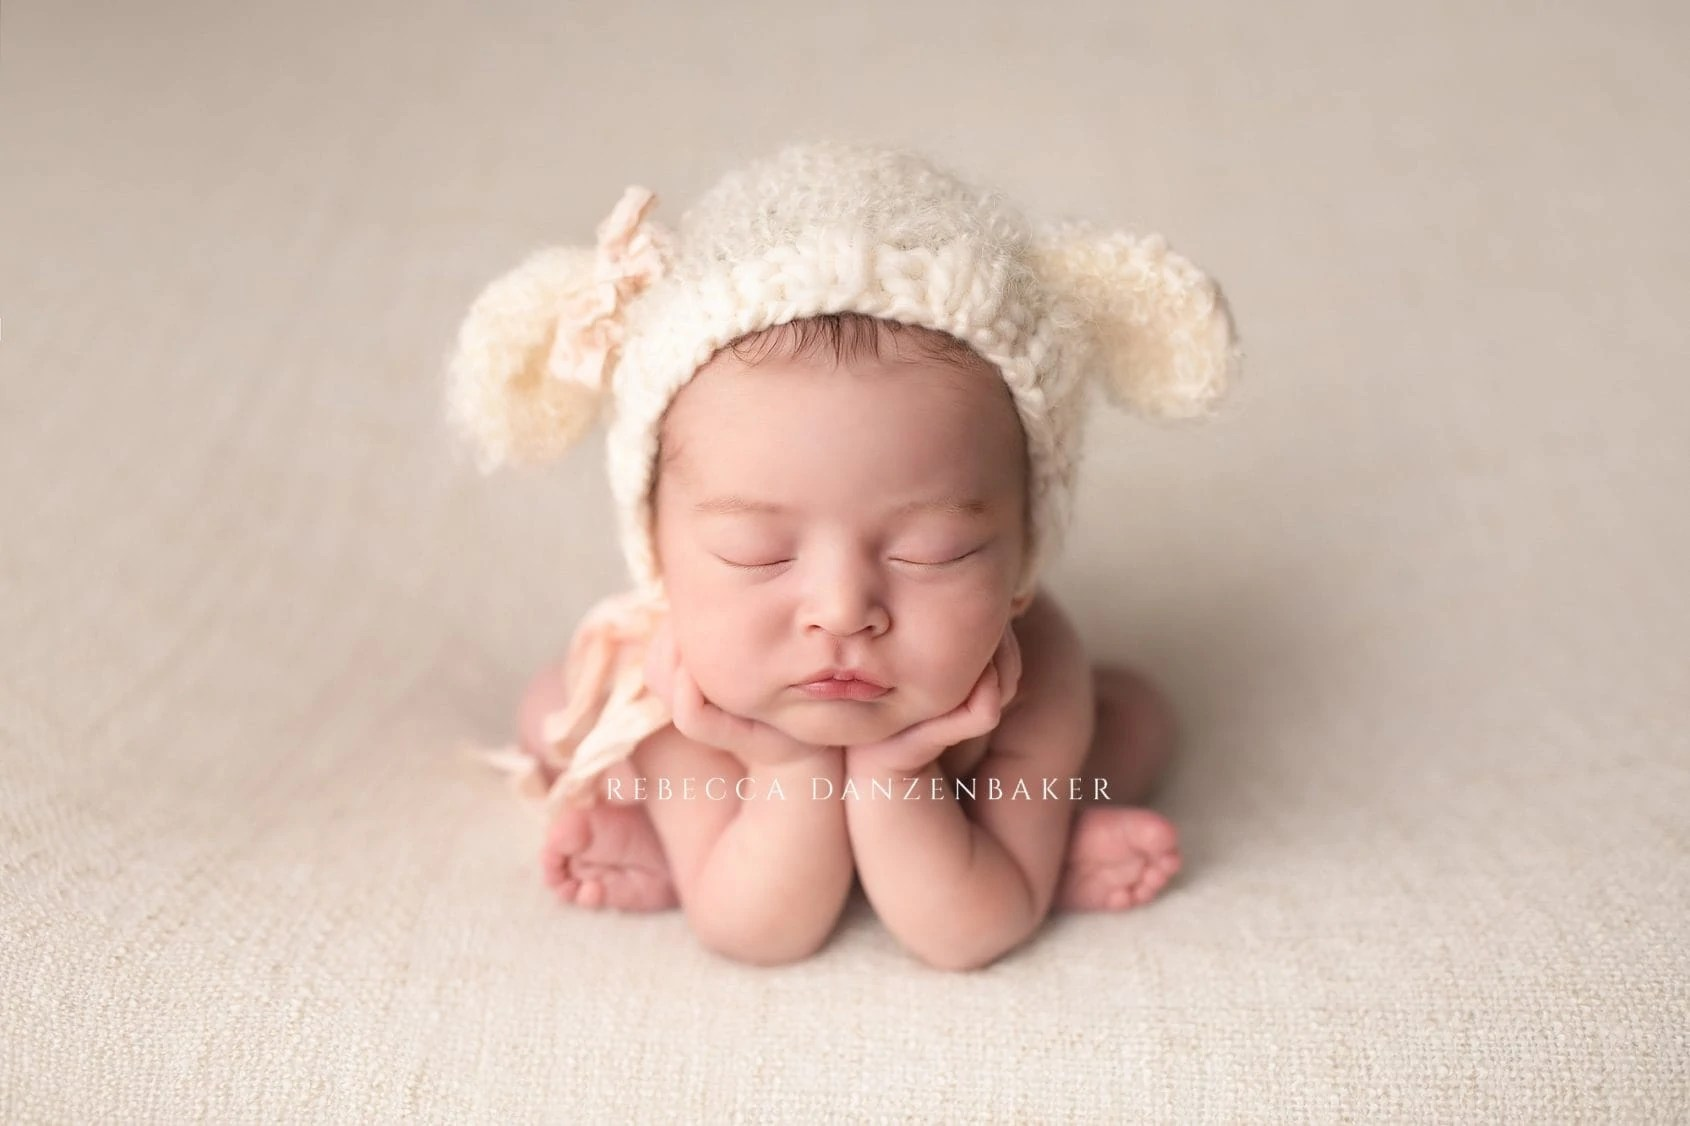 Newborn Baby Photoshoot in Studio by Ana Brandt (Music by Evan ...   1126x1690